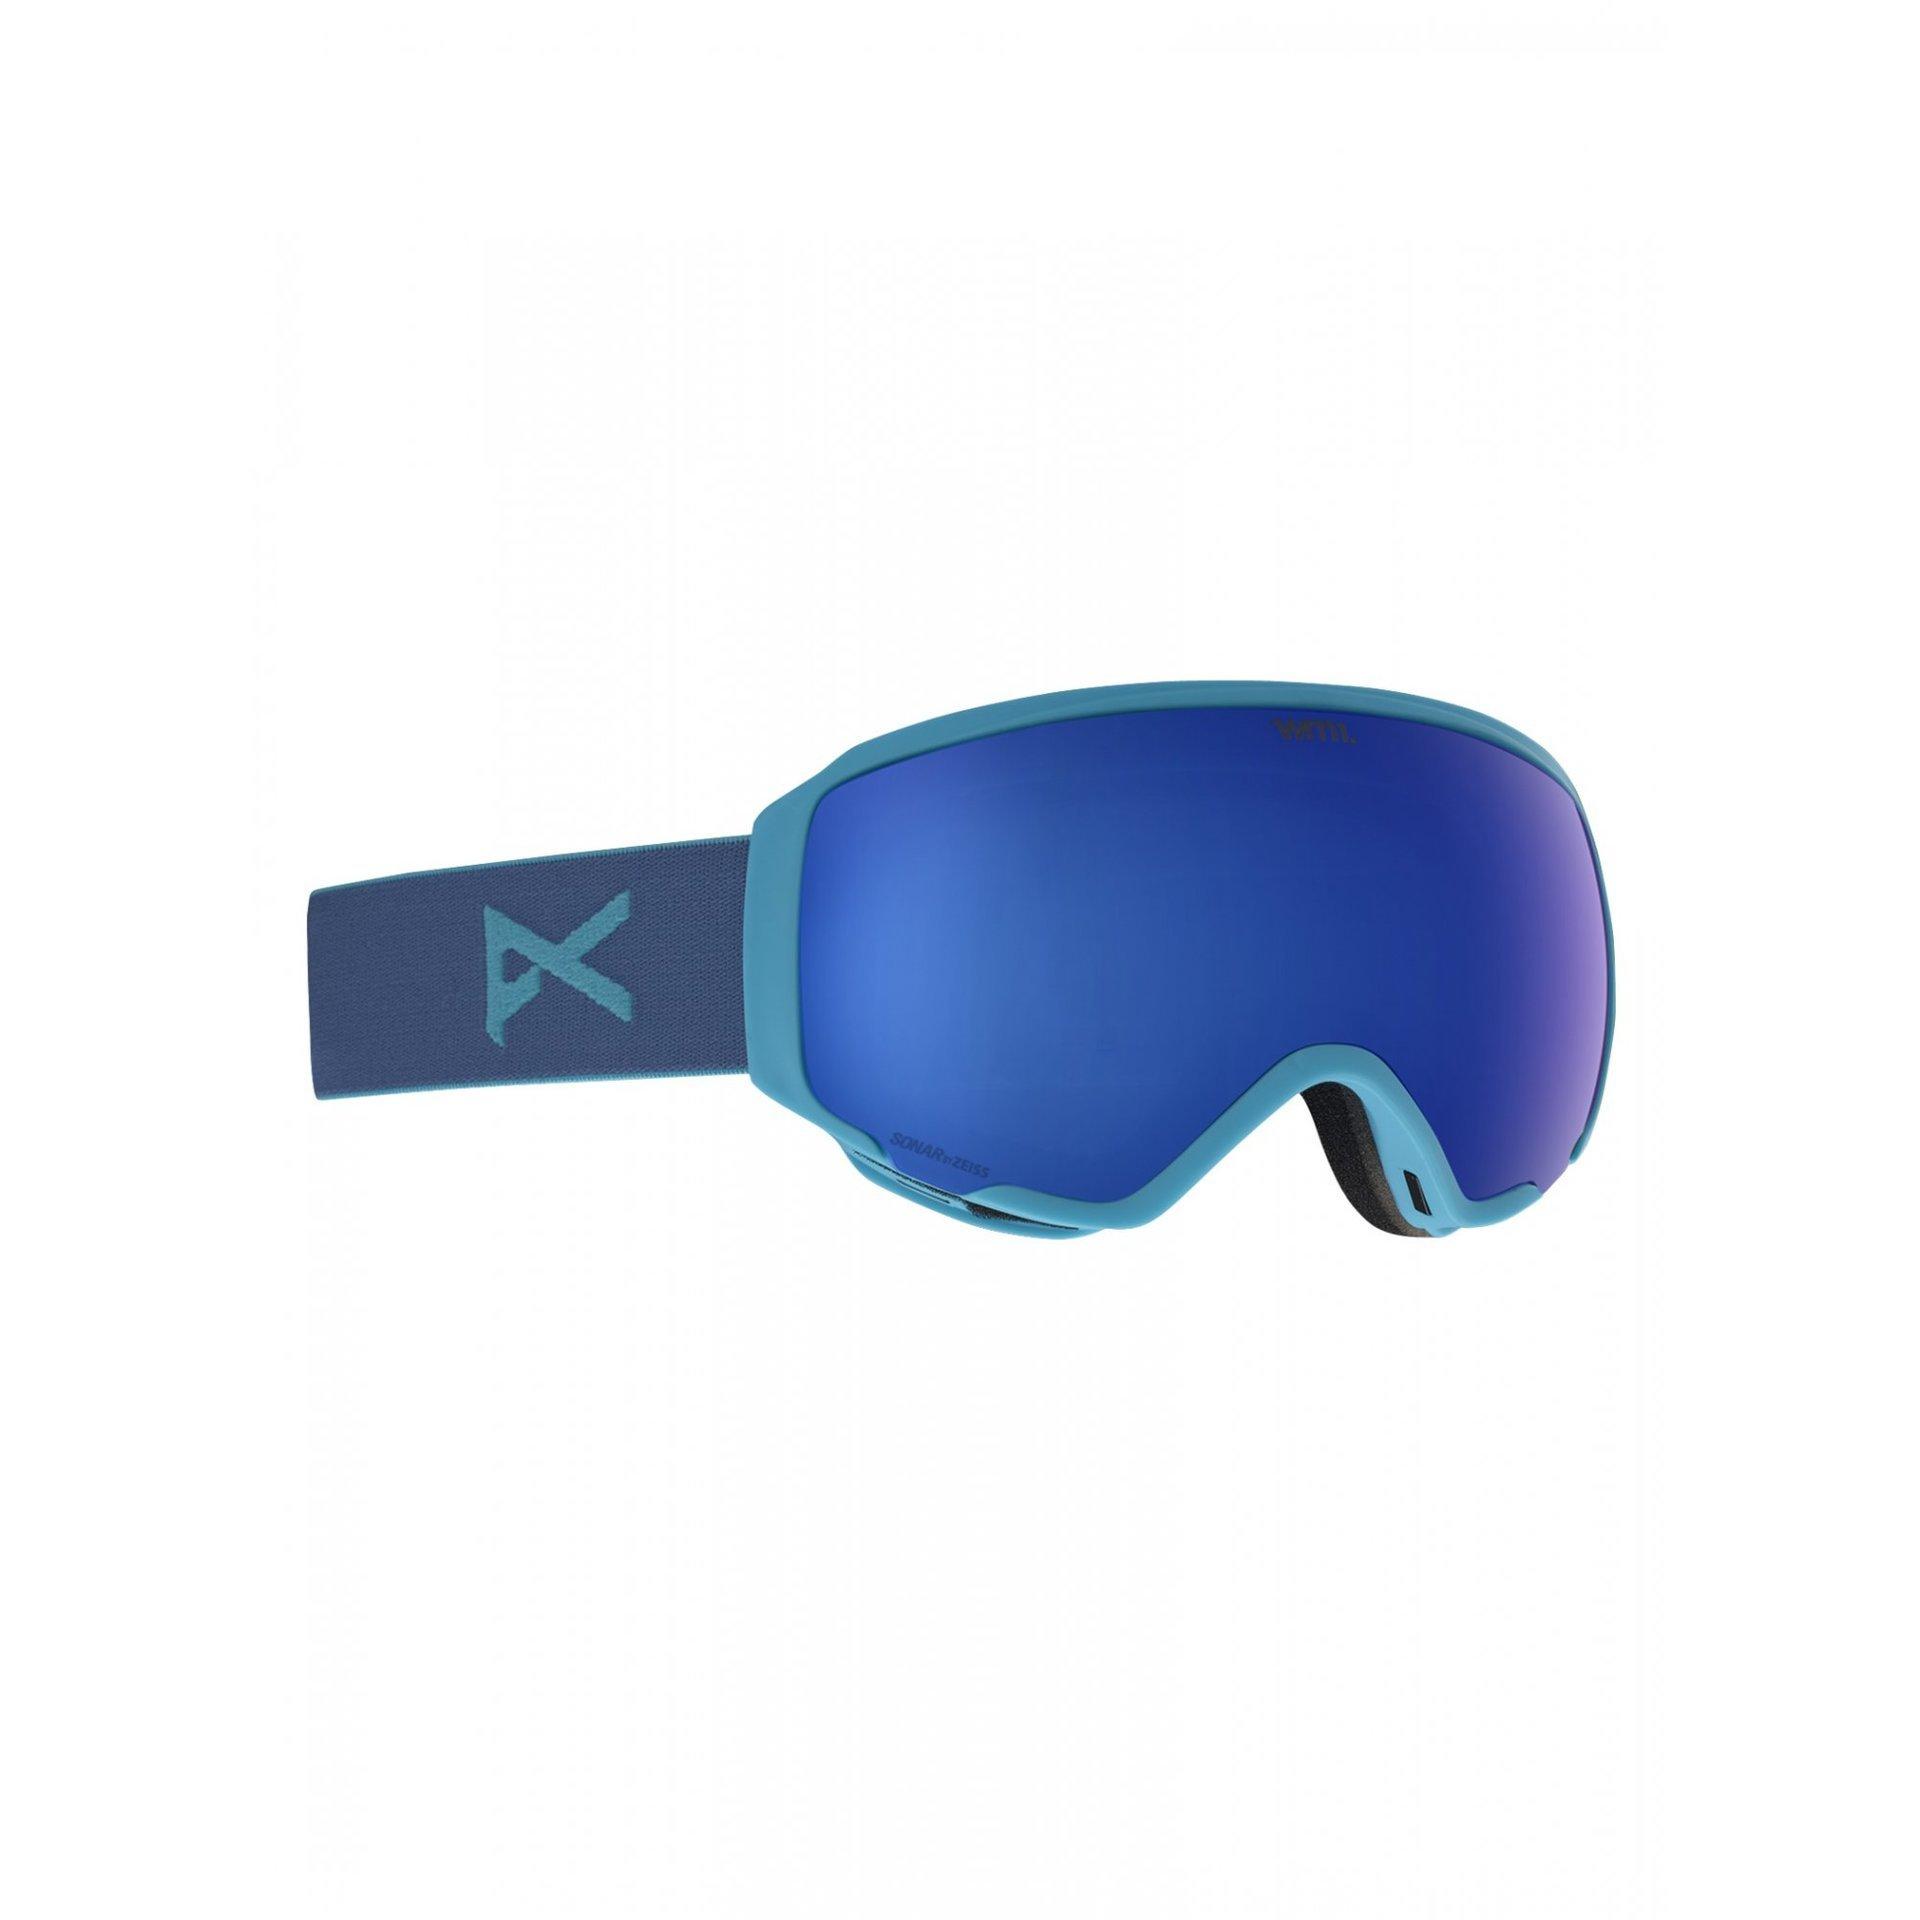 GOGLE ANON WM1 BLUE|SONAR INFRARED BLUE 1